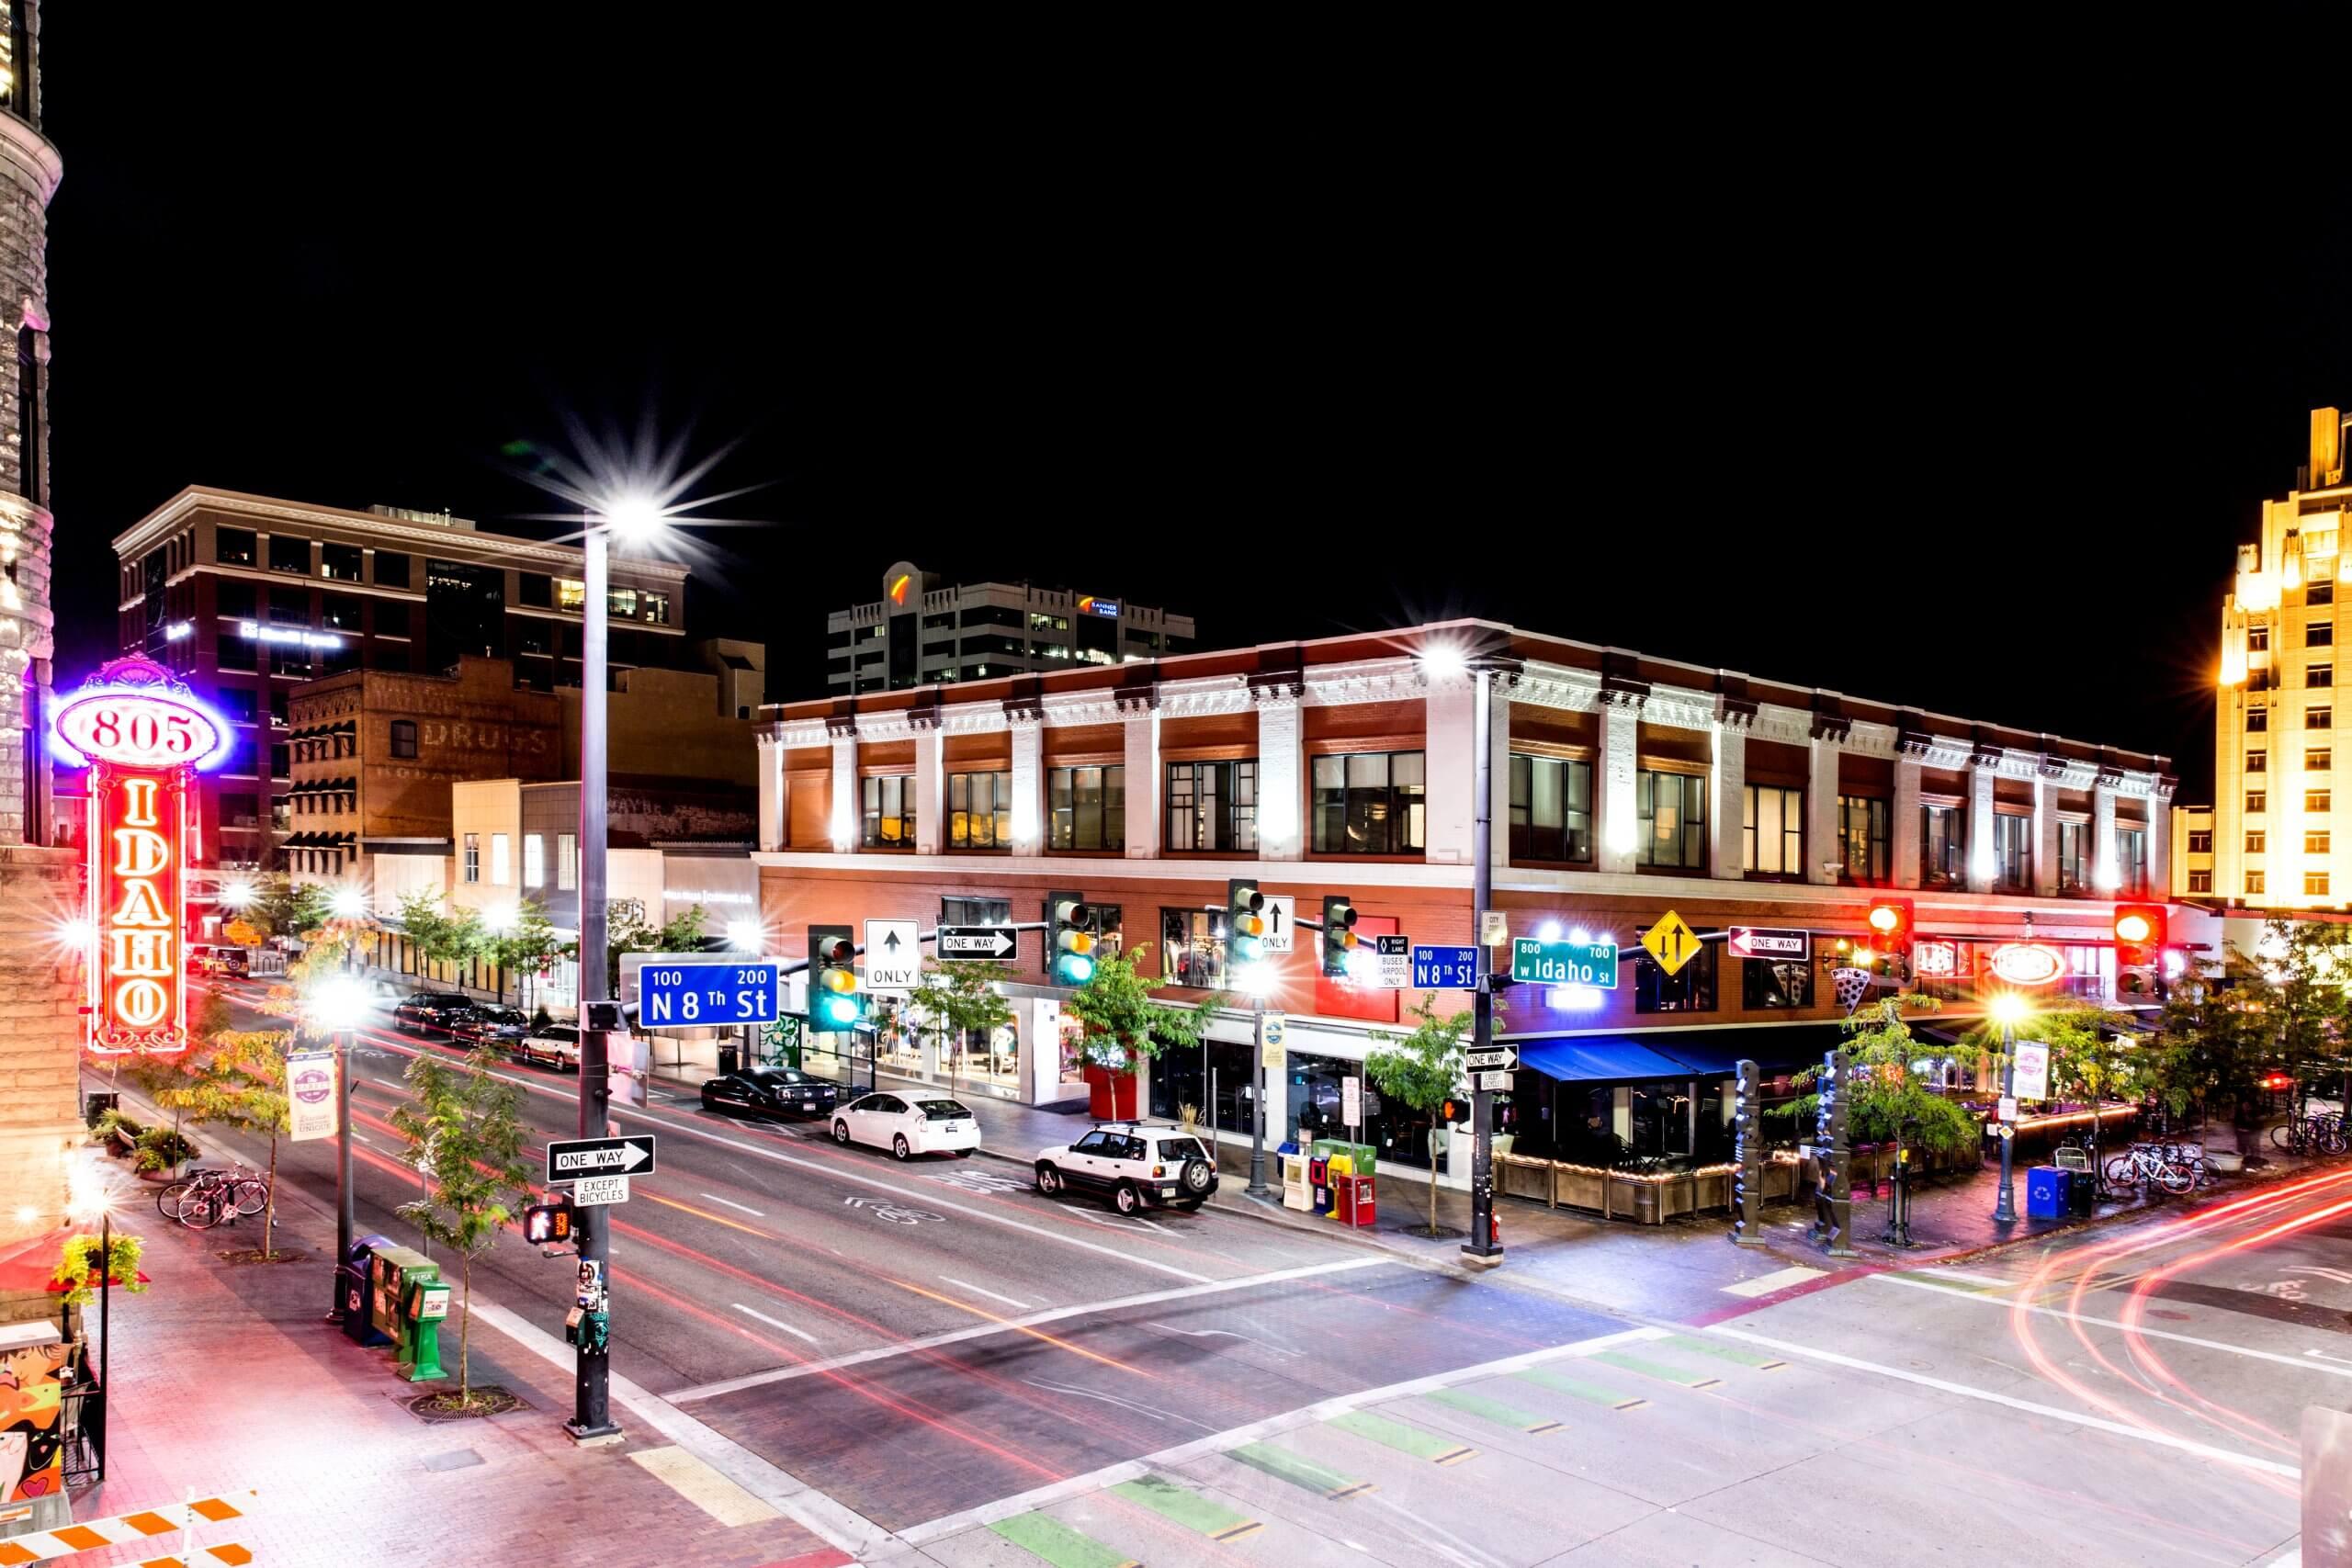 8th Street, Boise. Photo Credit: Idaho Tourism.